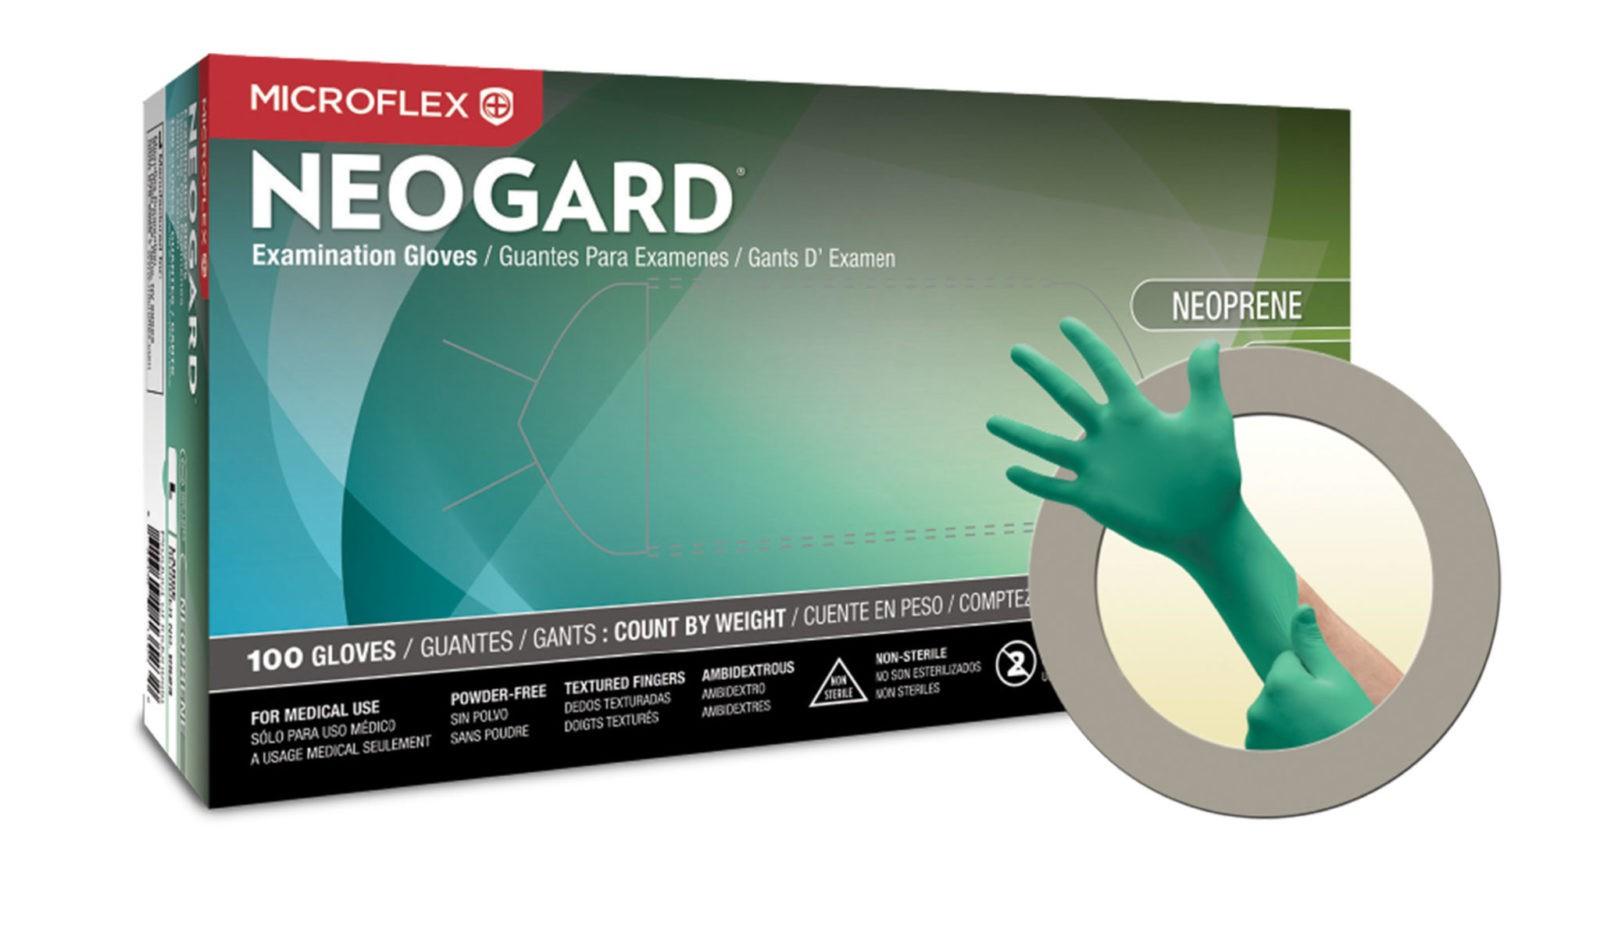 Black nitrile gloves xs - Microflex Neogard C52x Powder Free Chloroprene Exam Glove